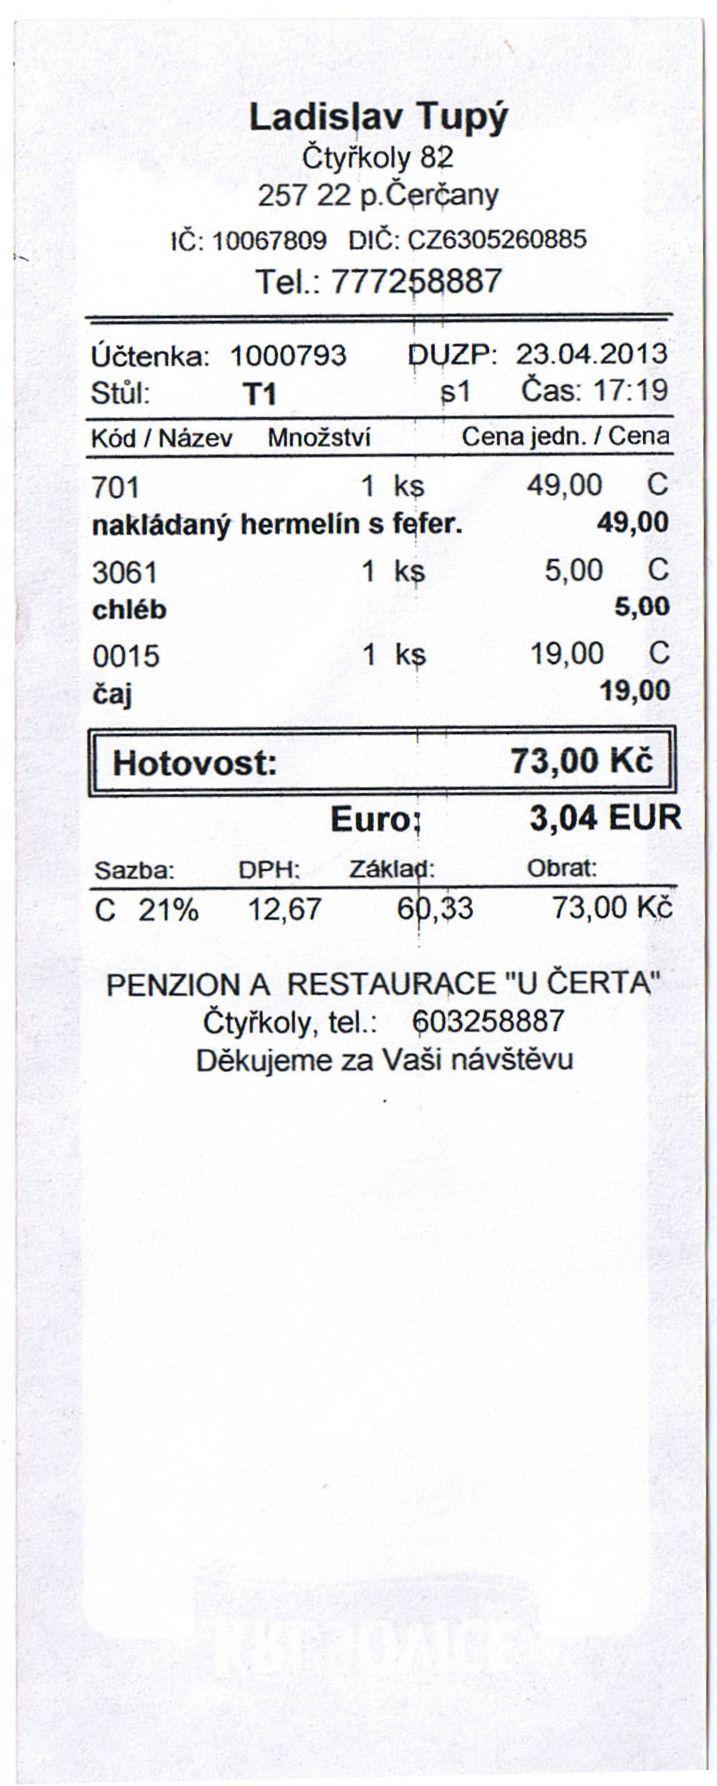 File Uctenka Ctyrkoly Jpg Wikimedia Commons